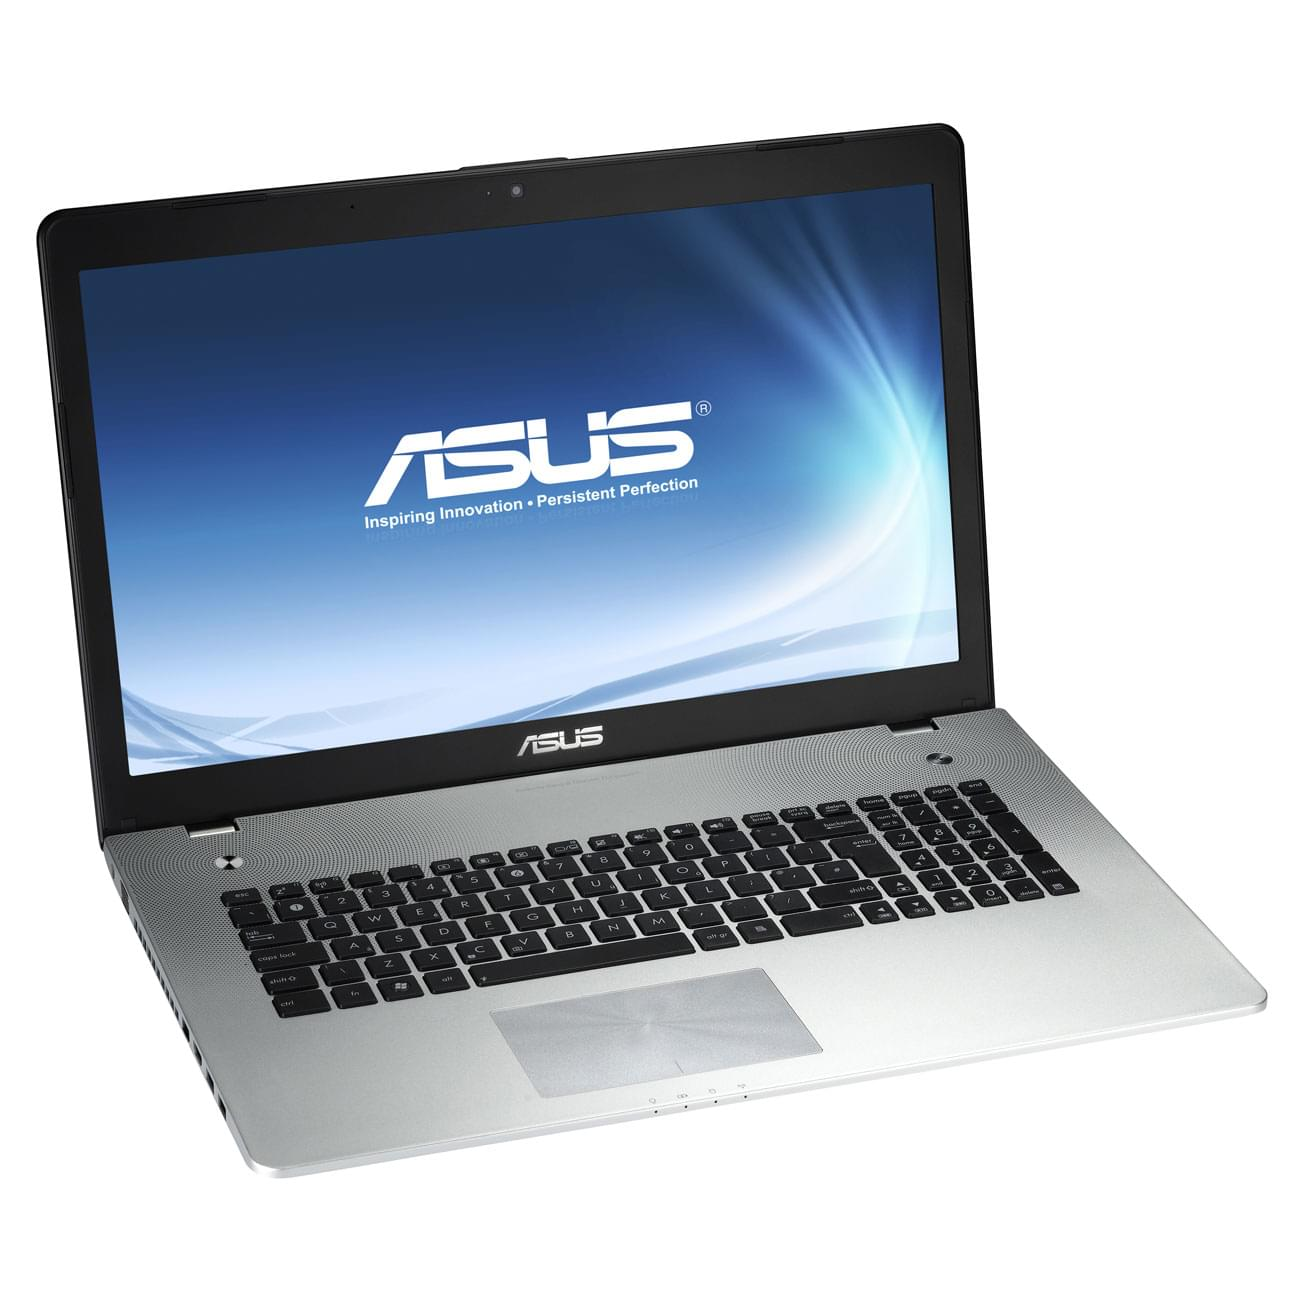 Asus N76VJ-T5078H - PC portable Asus - Cybertek.fr - 0